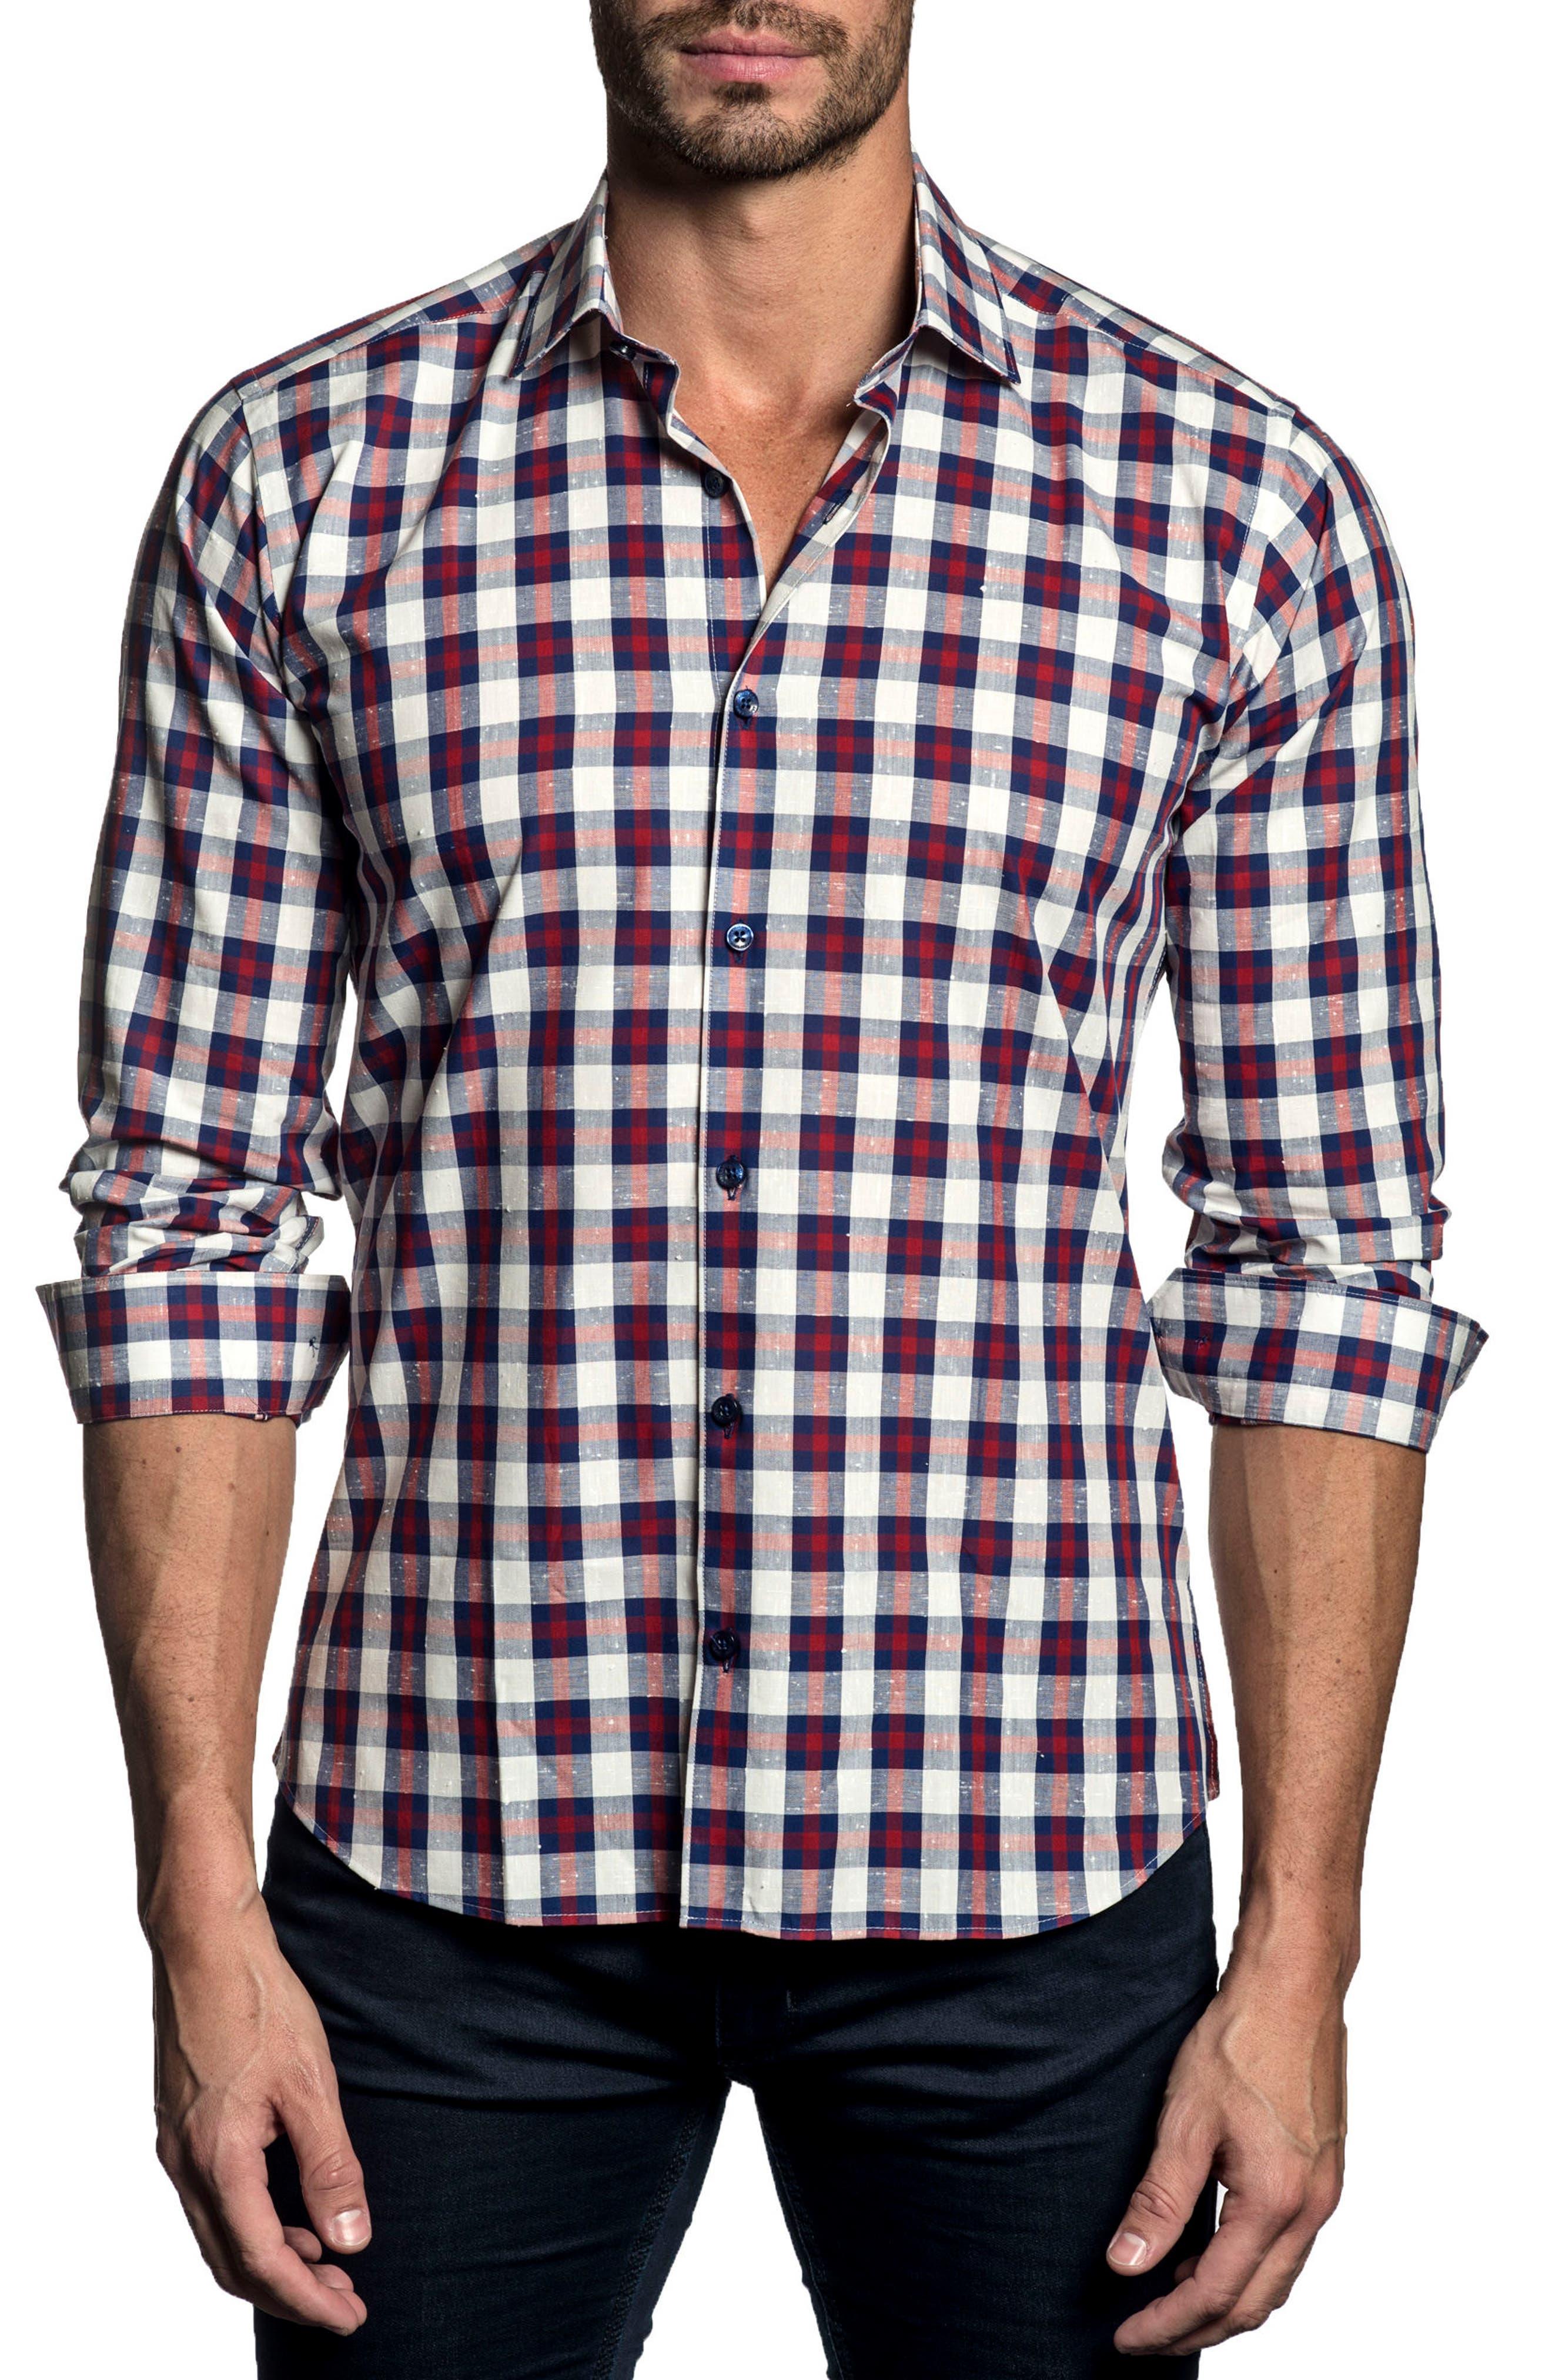 Trim Fit Plaid Sport Shirt,                             Main thumbnail 1, color,                             White - Blue - Red Check